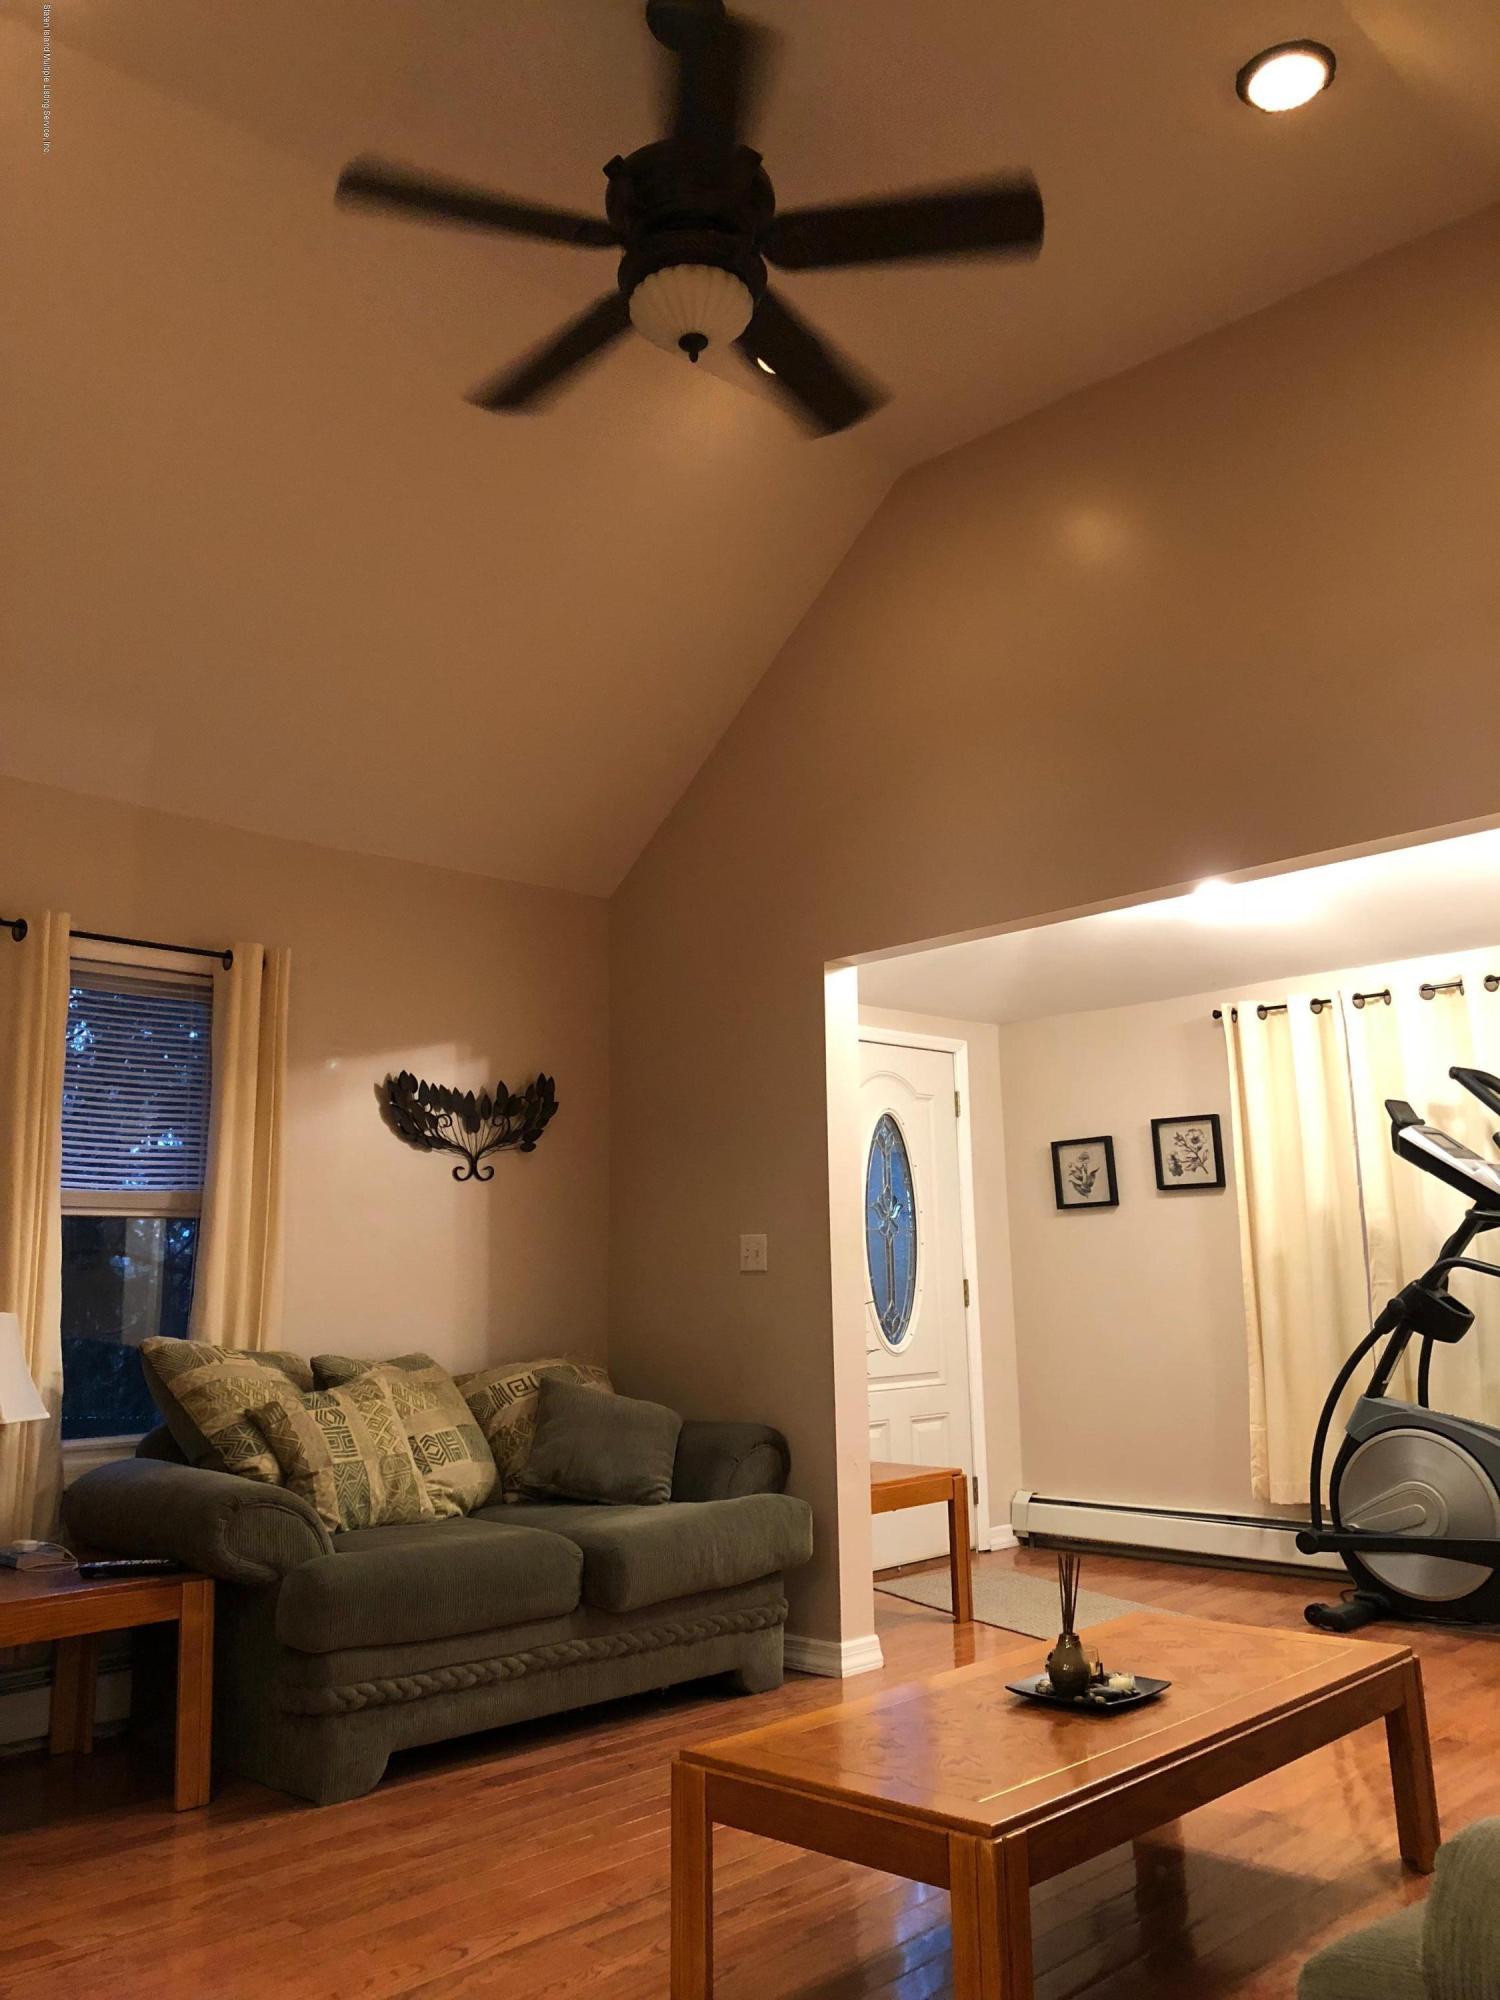 Single Family - Detached 26 Glenwood Avenue  Staten Island, NY 10301, MLS-1123690-11